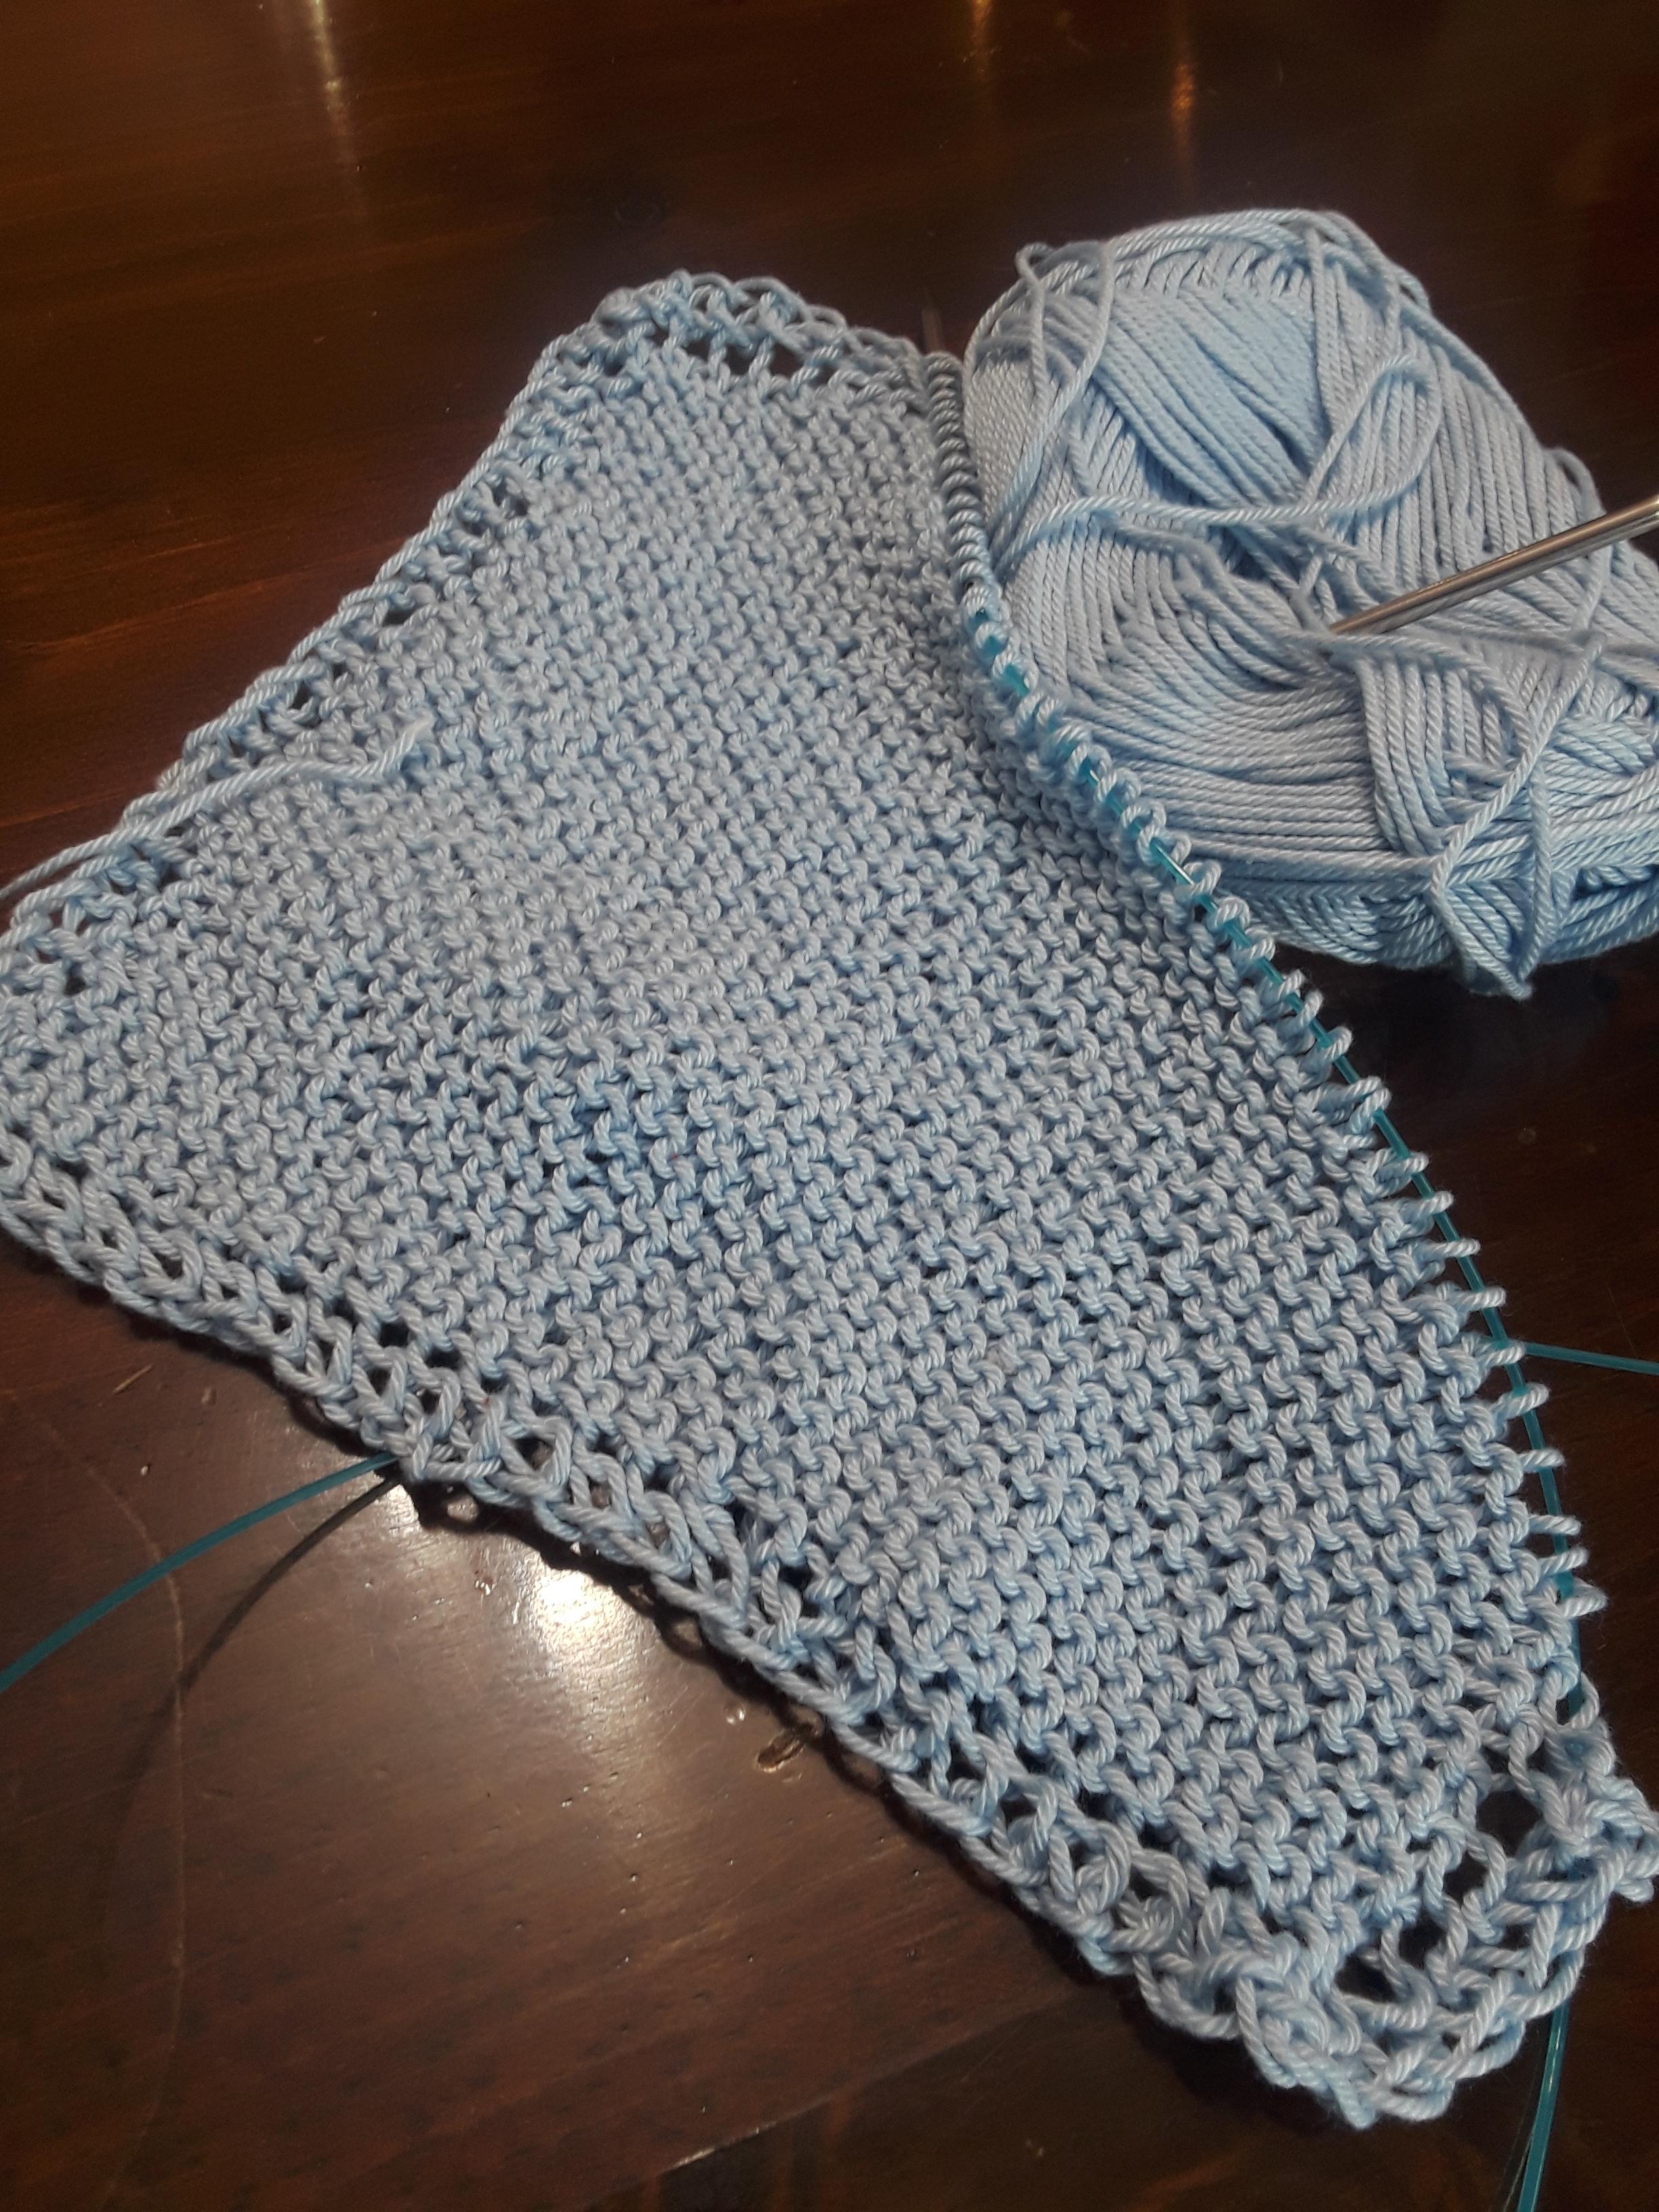 Grandmother's Favorite Washcloth.jpg